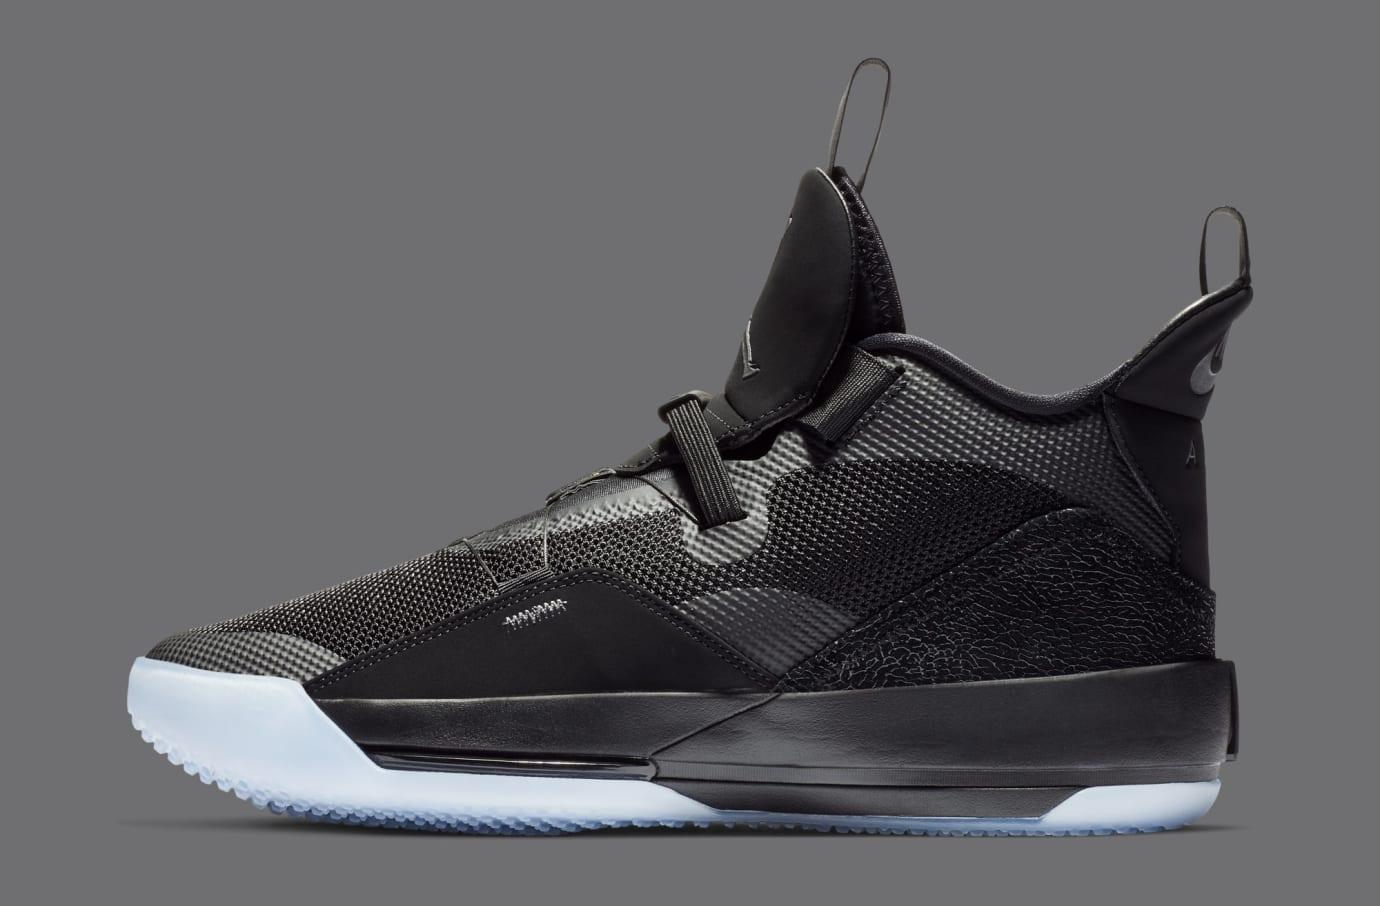 33 Dark Air Grey Aq8830 Jordan Blackwhite 'utility Blackout' 002 8mwvNn0O